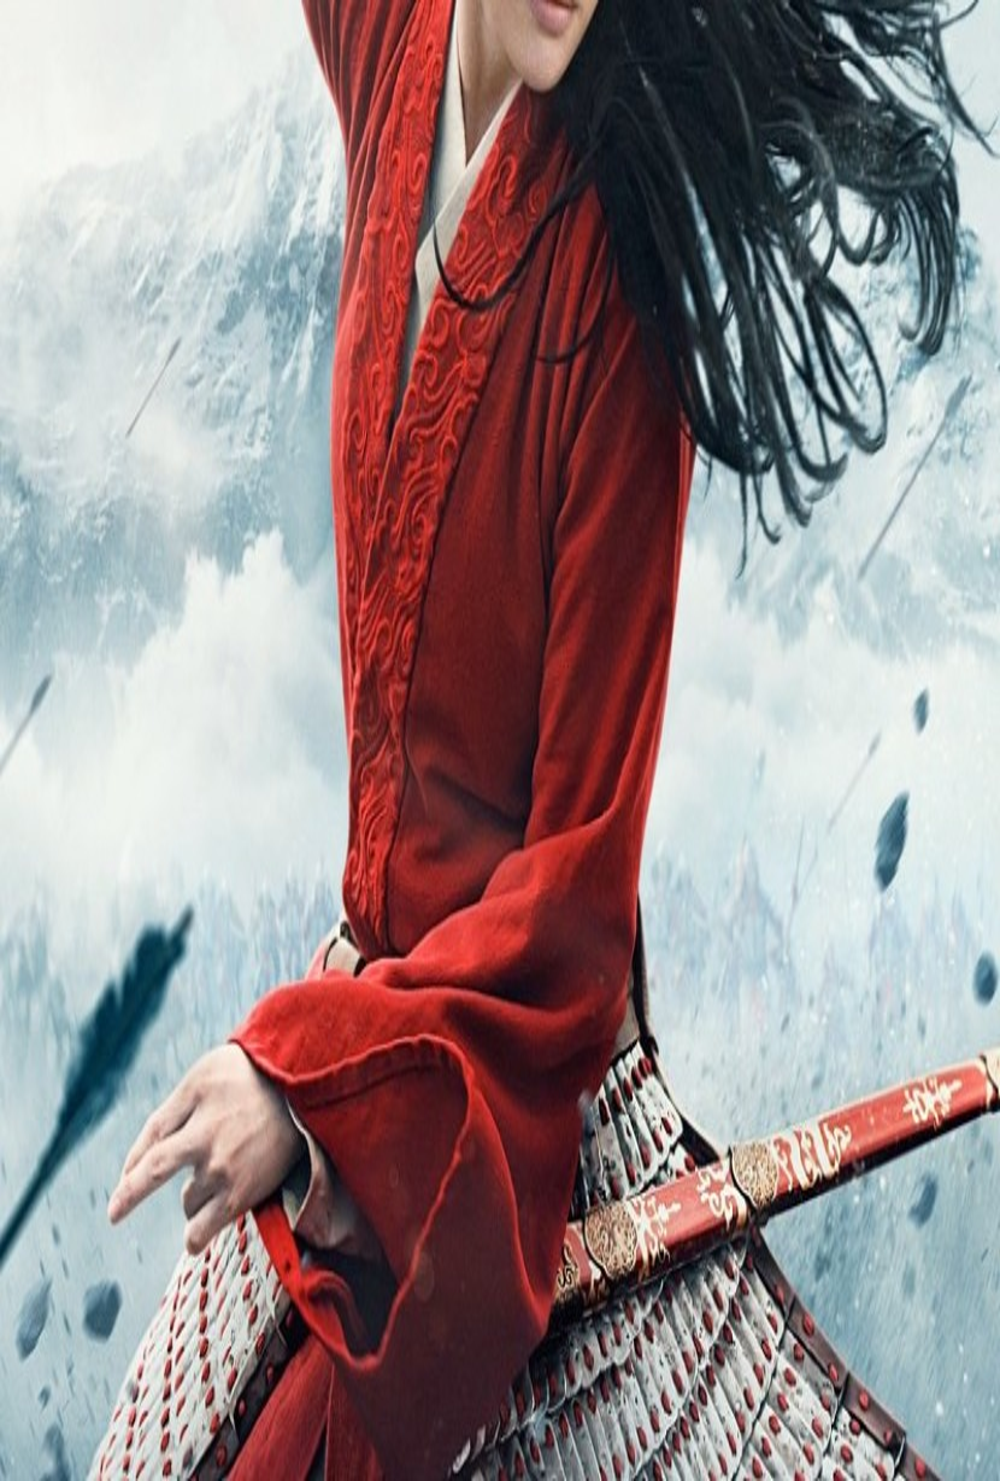 Mulan: Νέο trailer για τη live-action μεταφορά της Disney